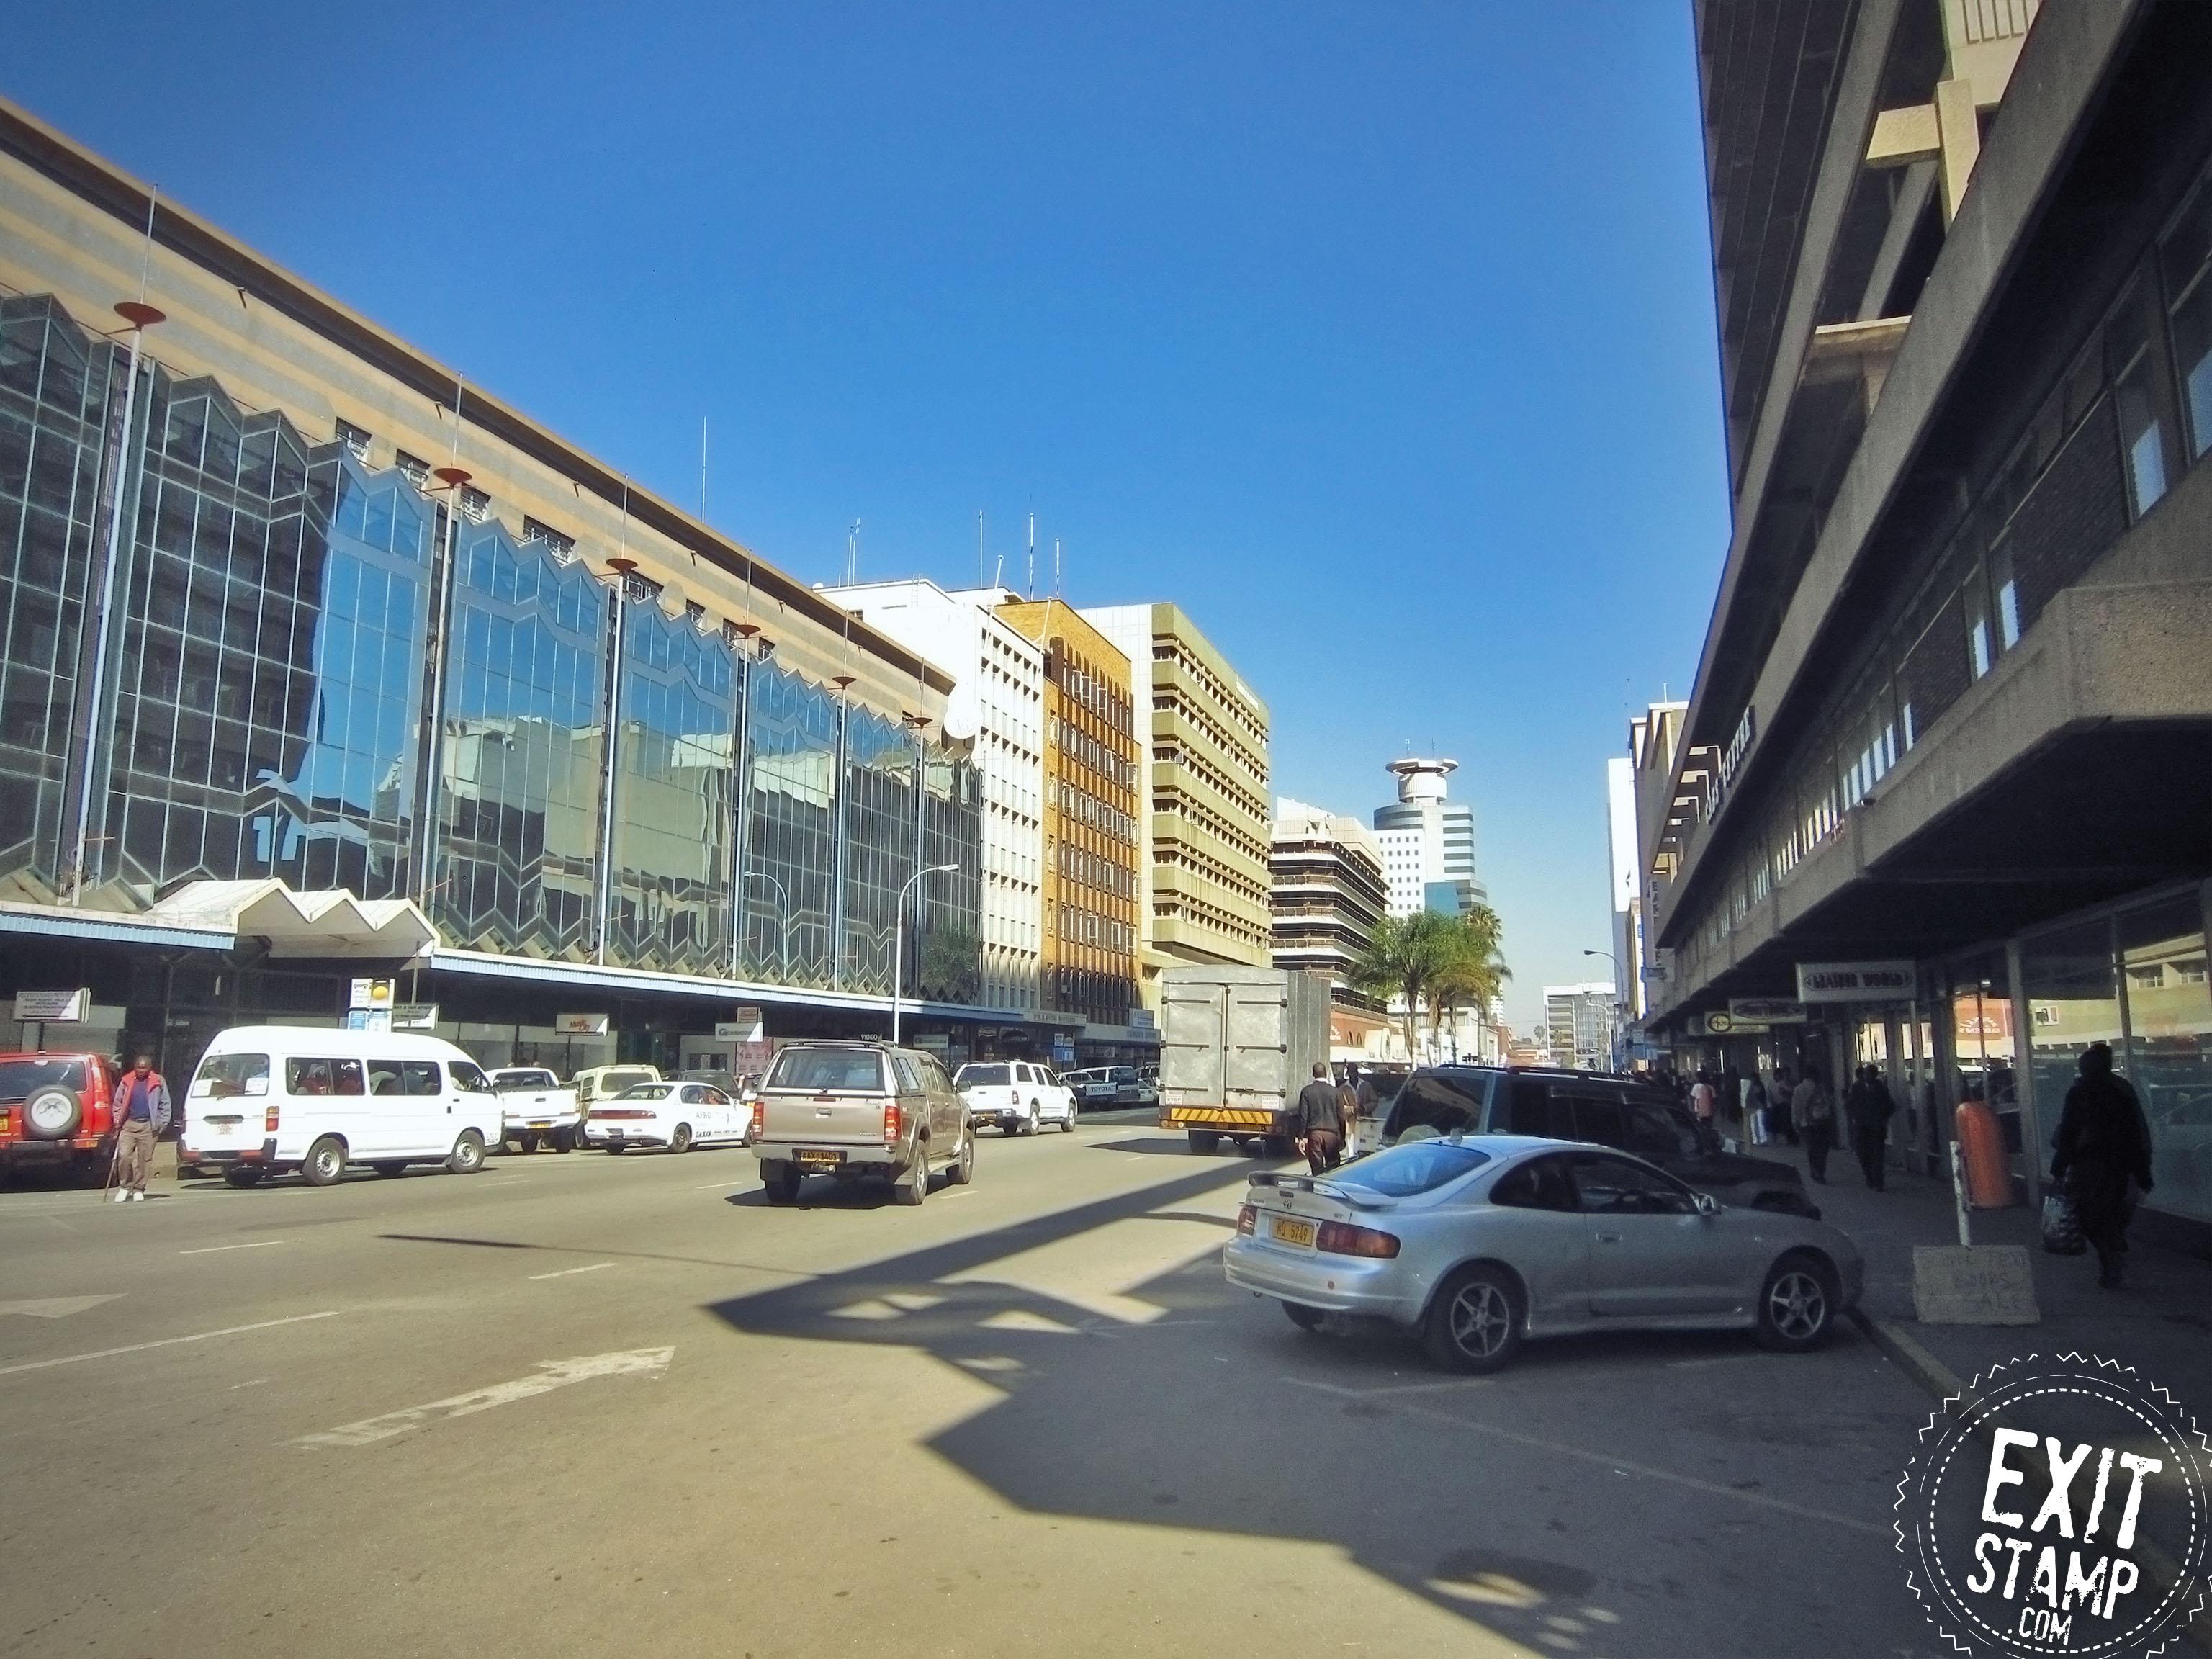 Harare City Zimbabwe